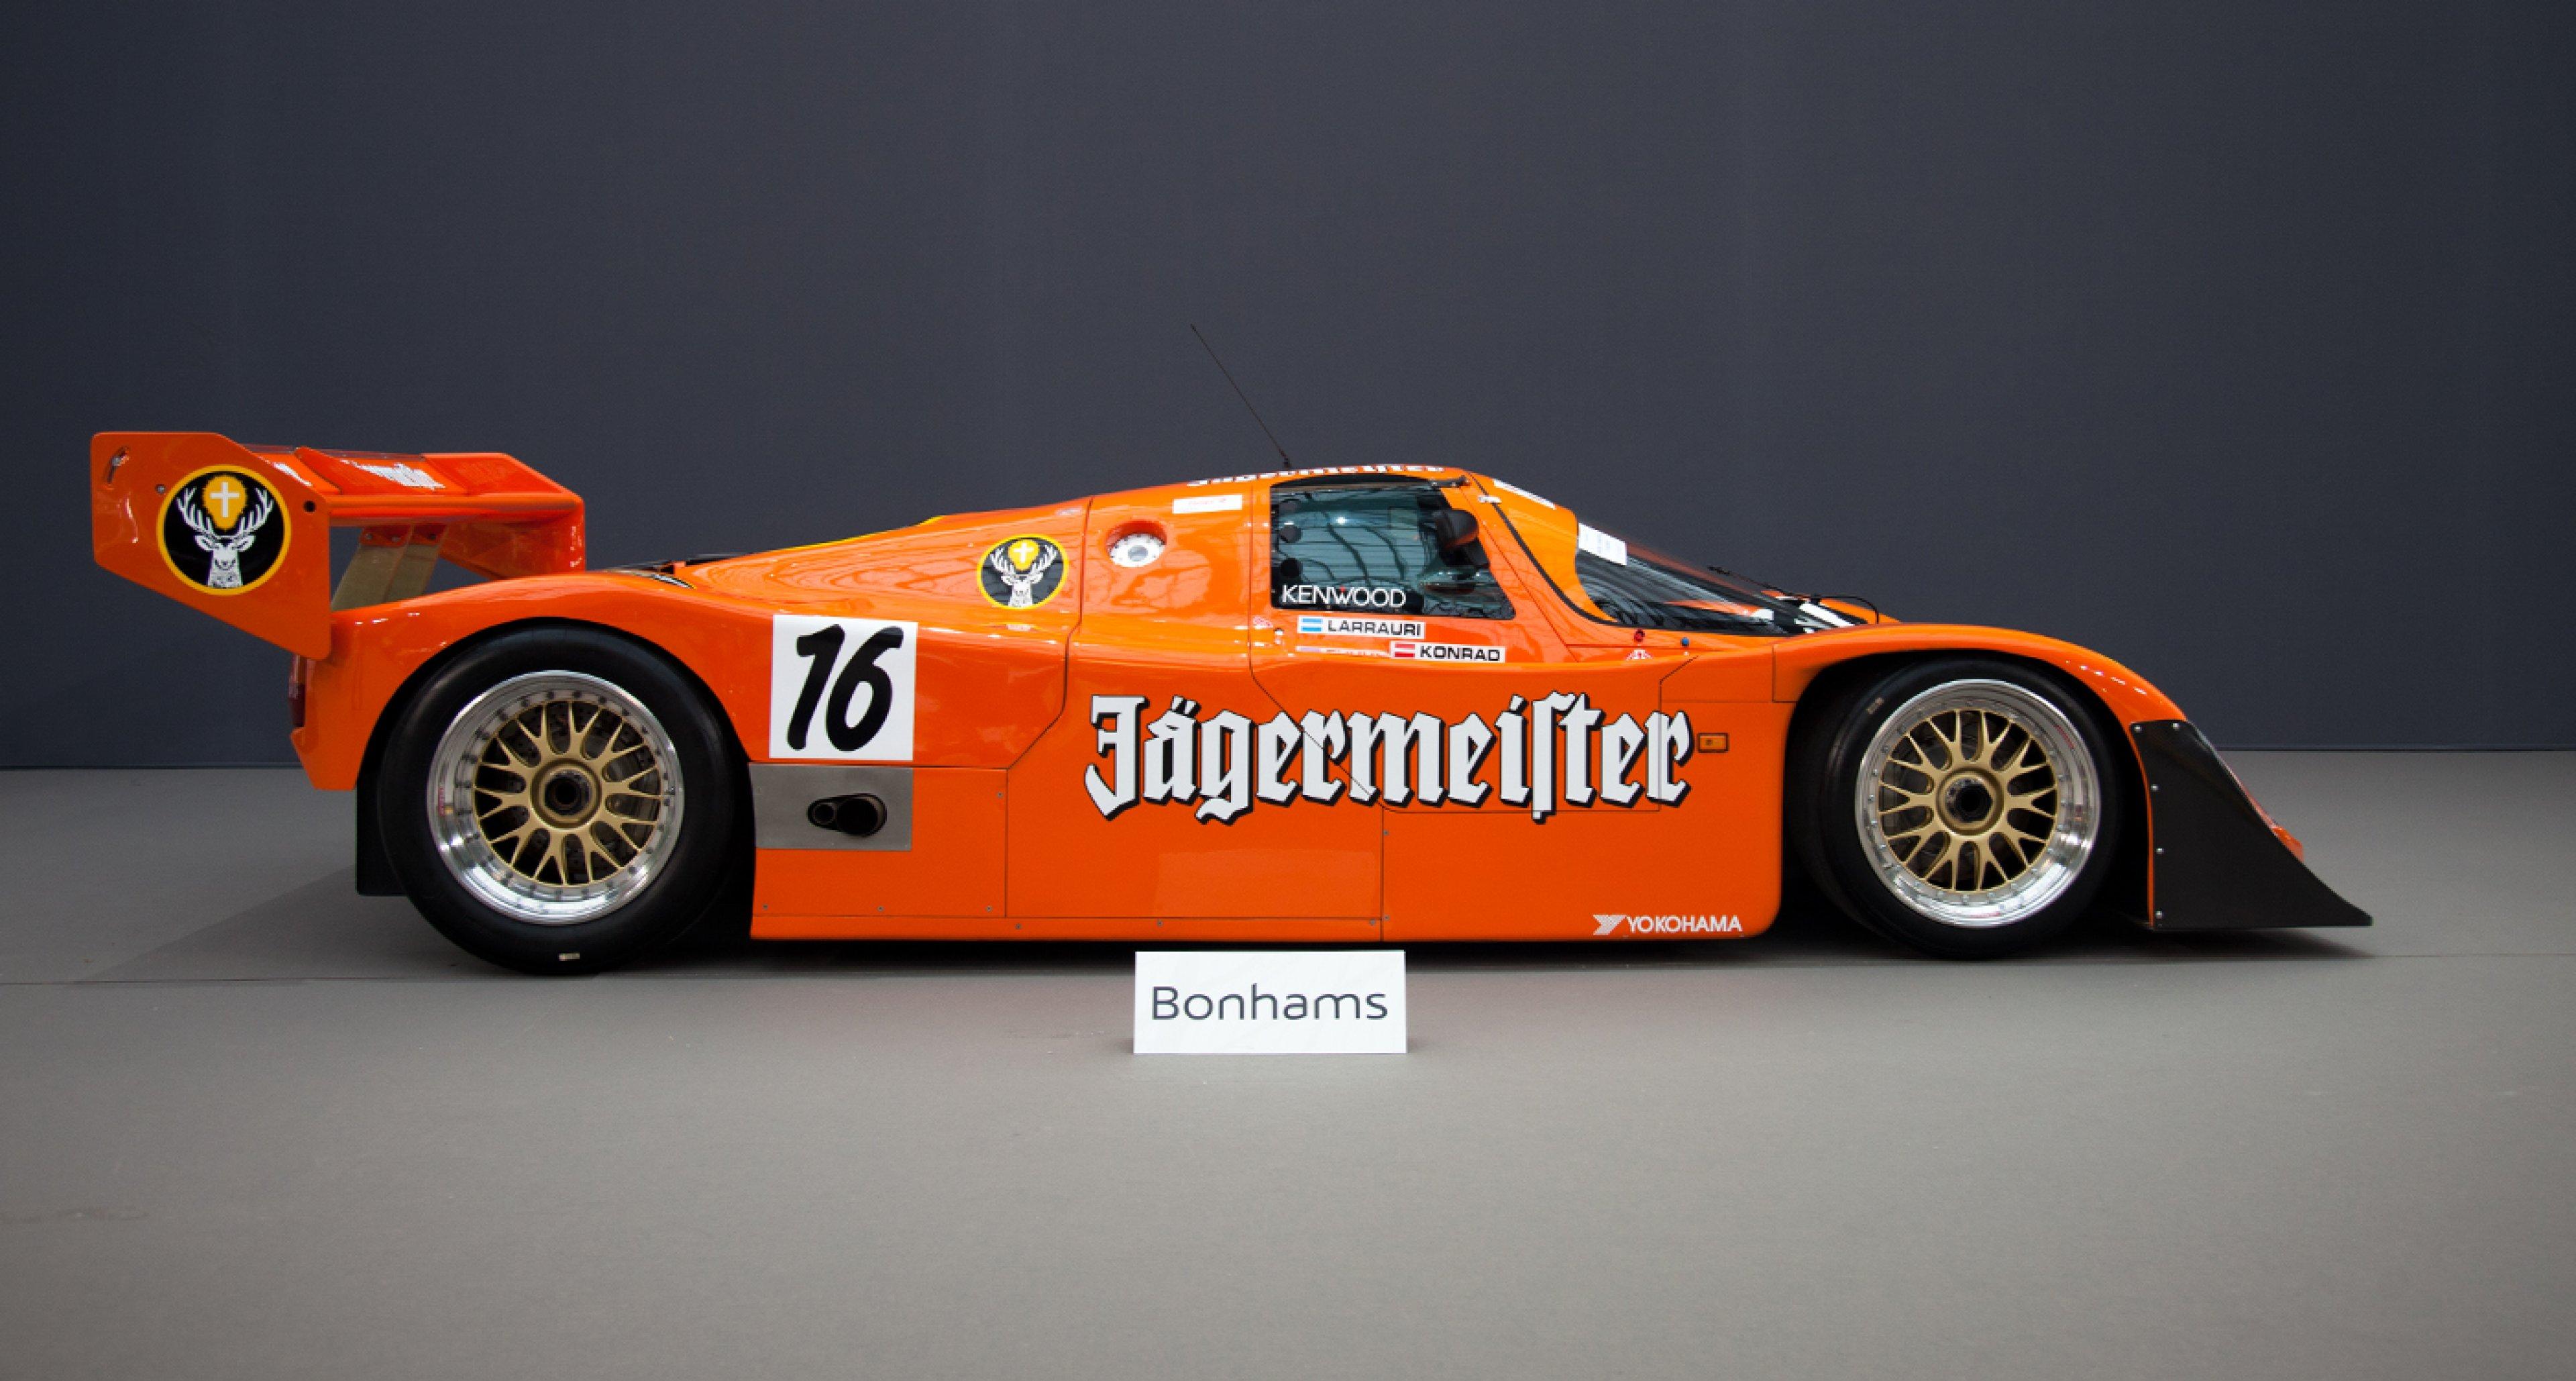 1989 Porsche 962 C Jägermeister at Bonhams 2014 Retromobile sale.